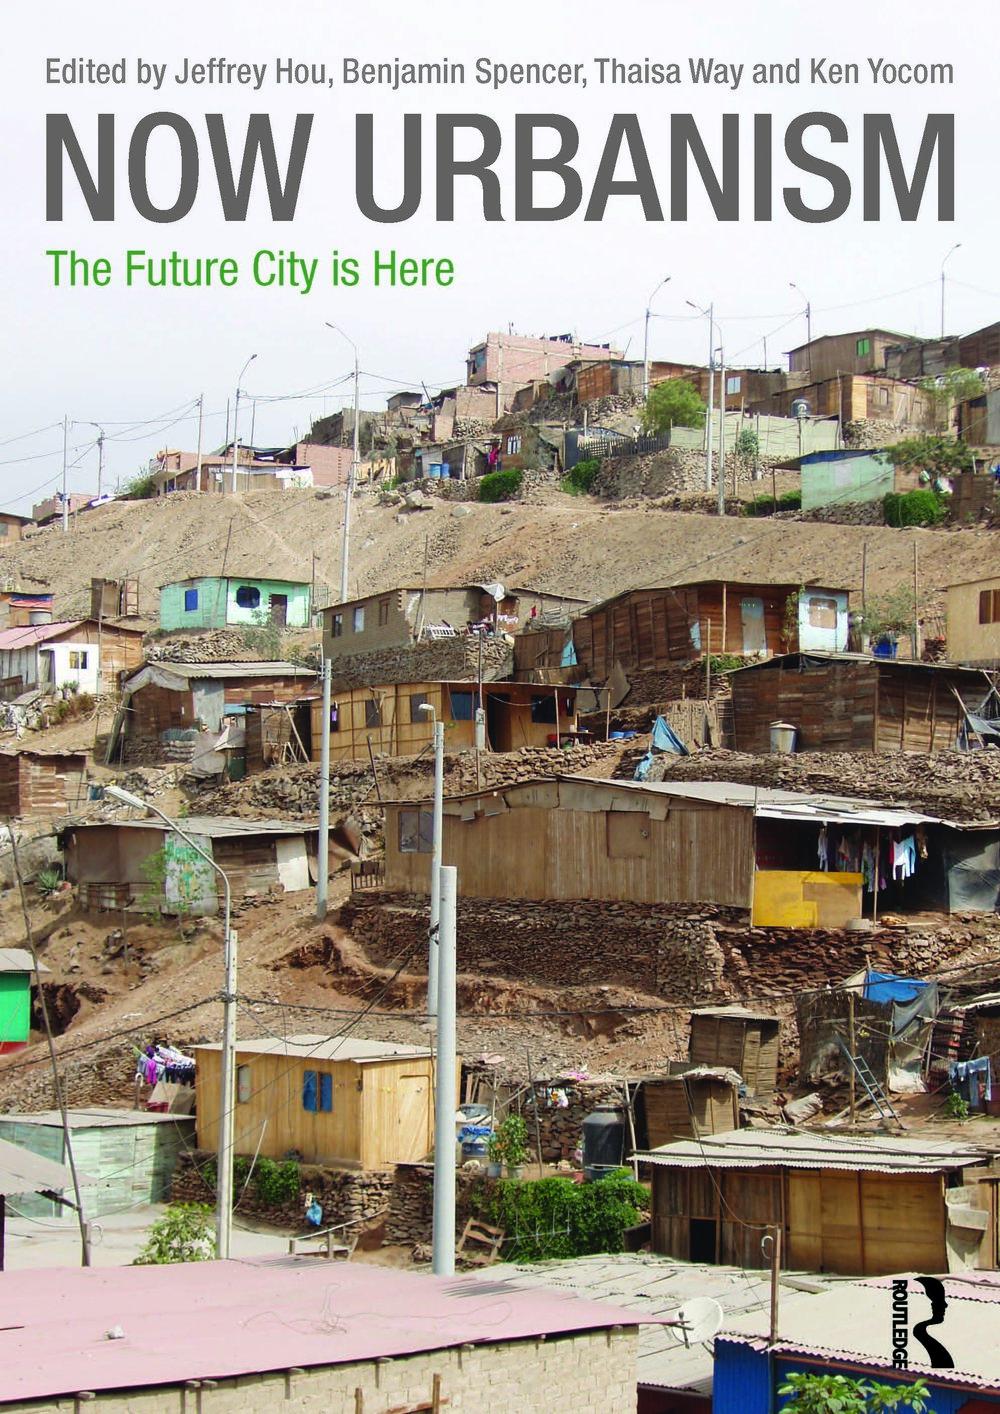 Now urbanism_final.jpg